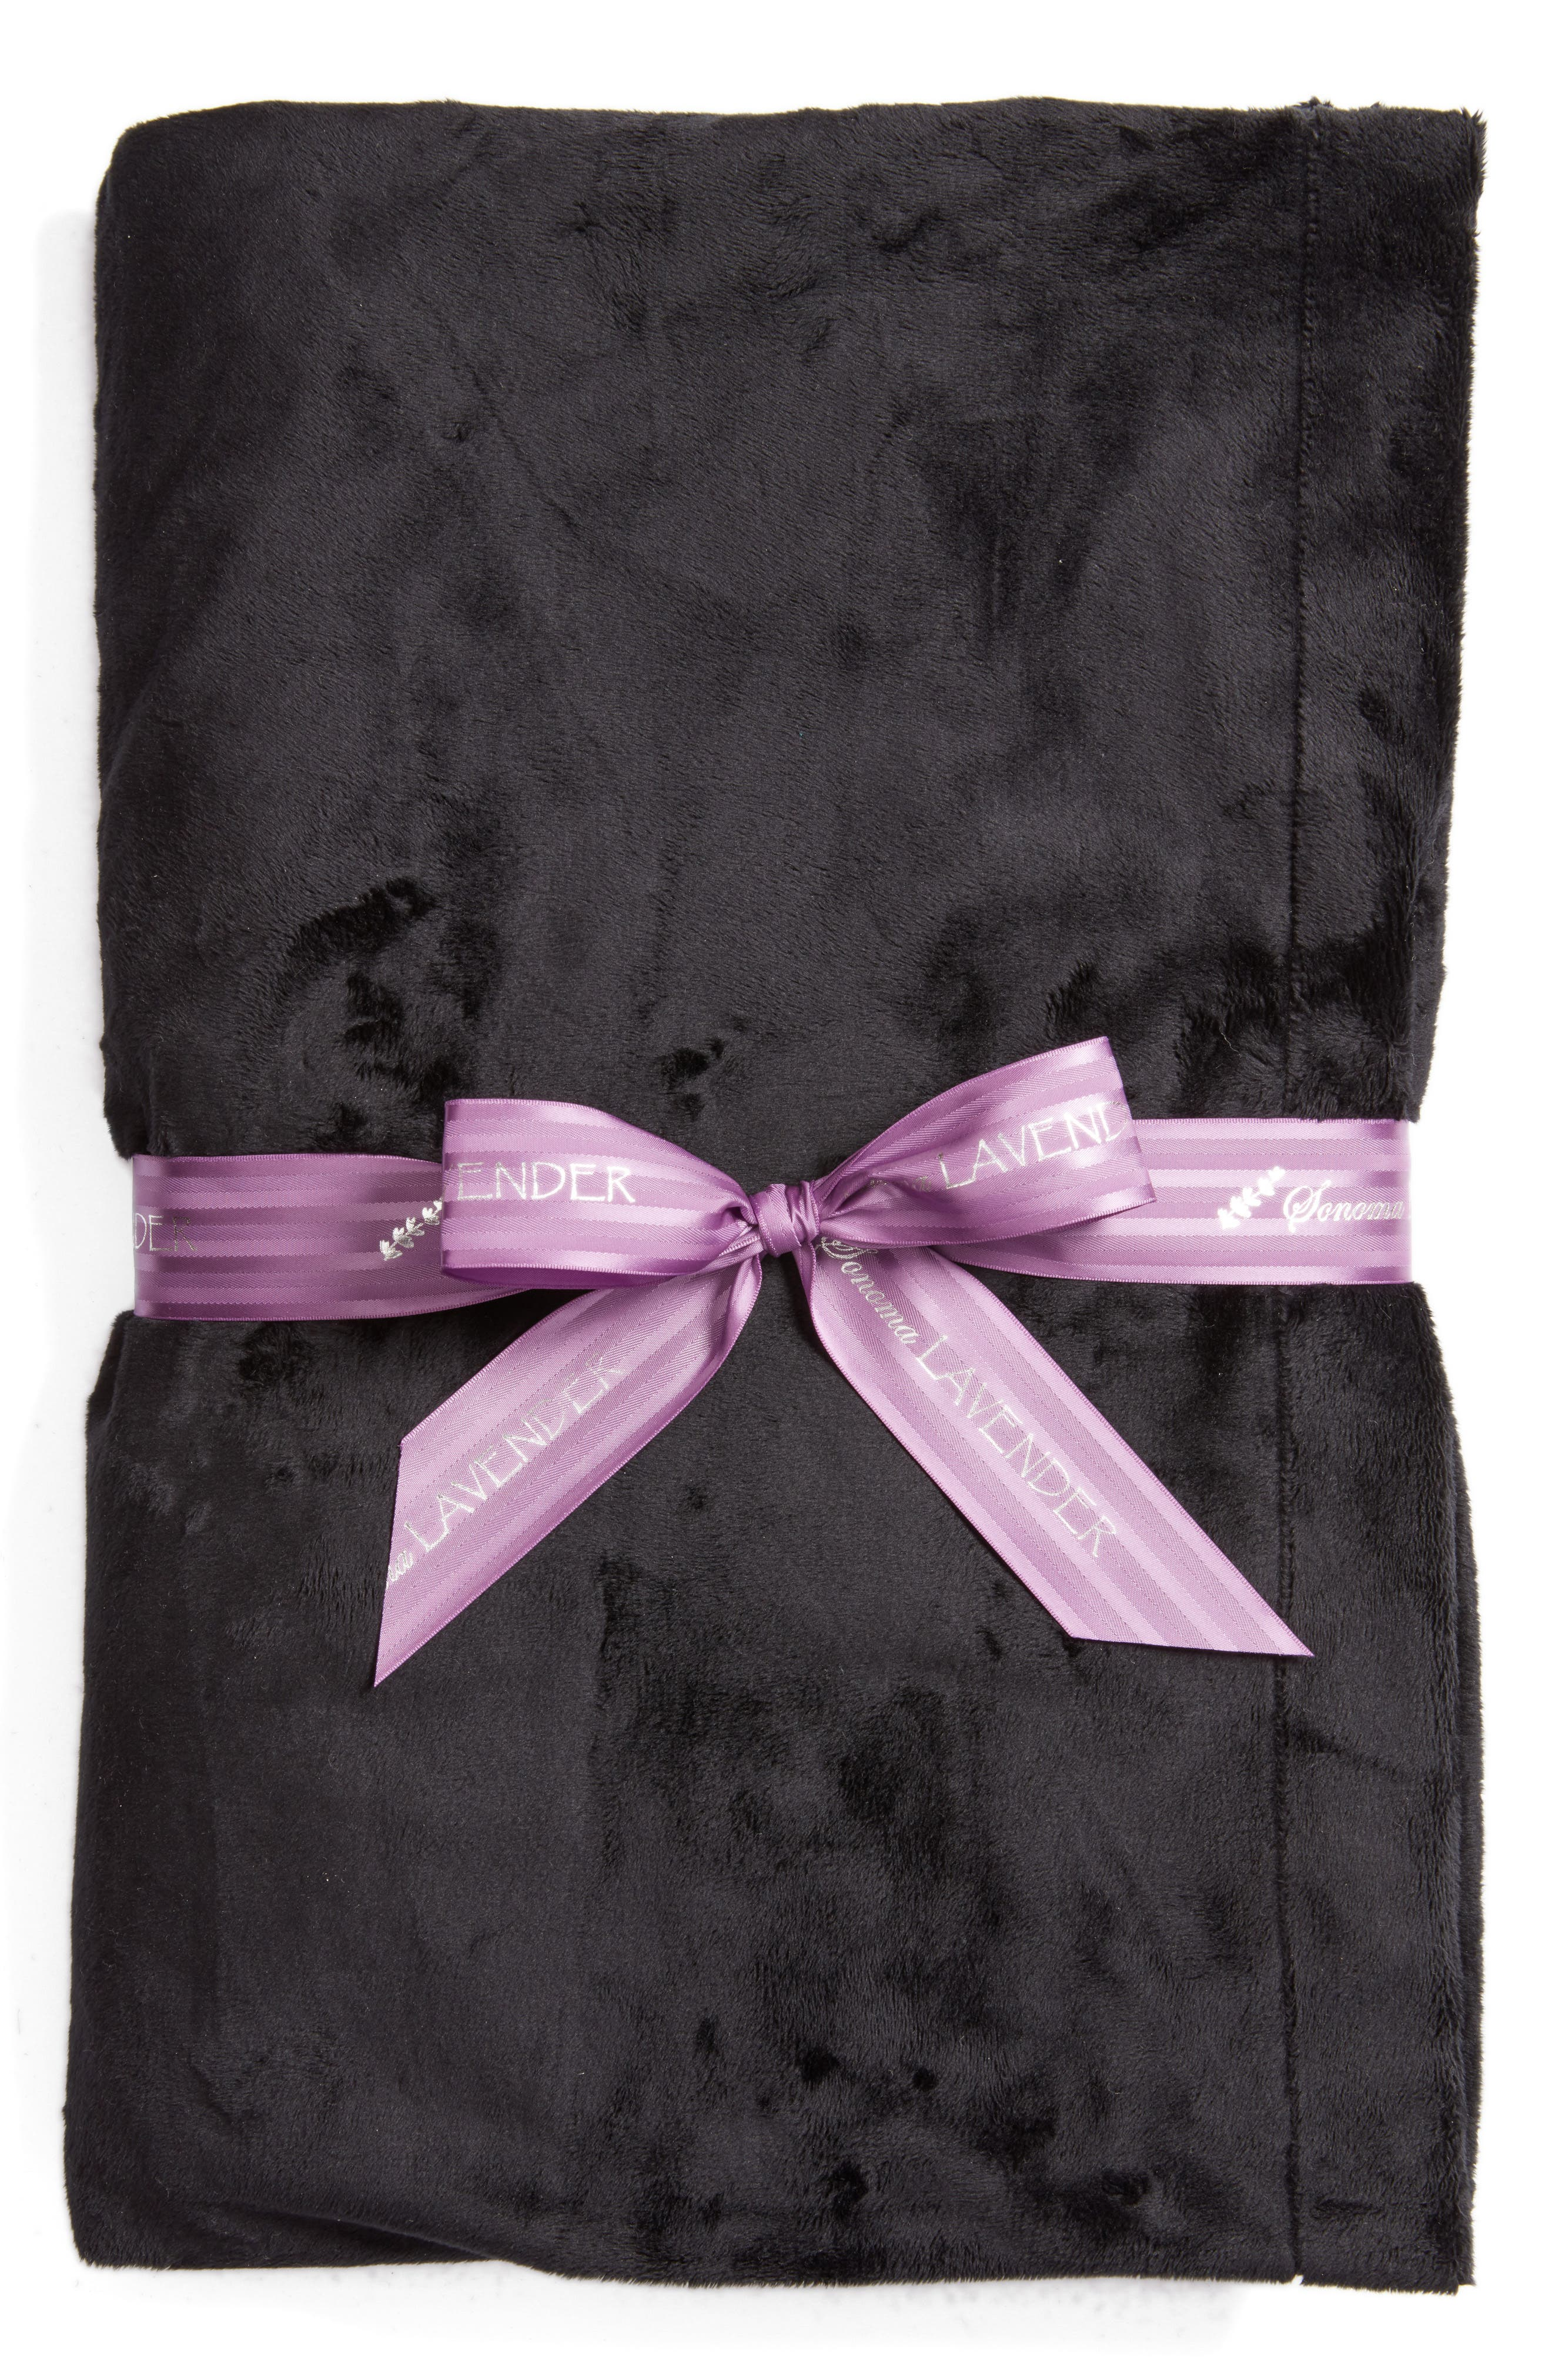 Main Image - Sonoma Lavender Solid Black Blankie